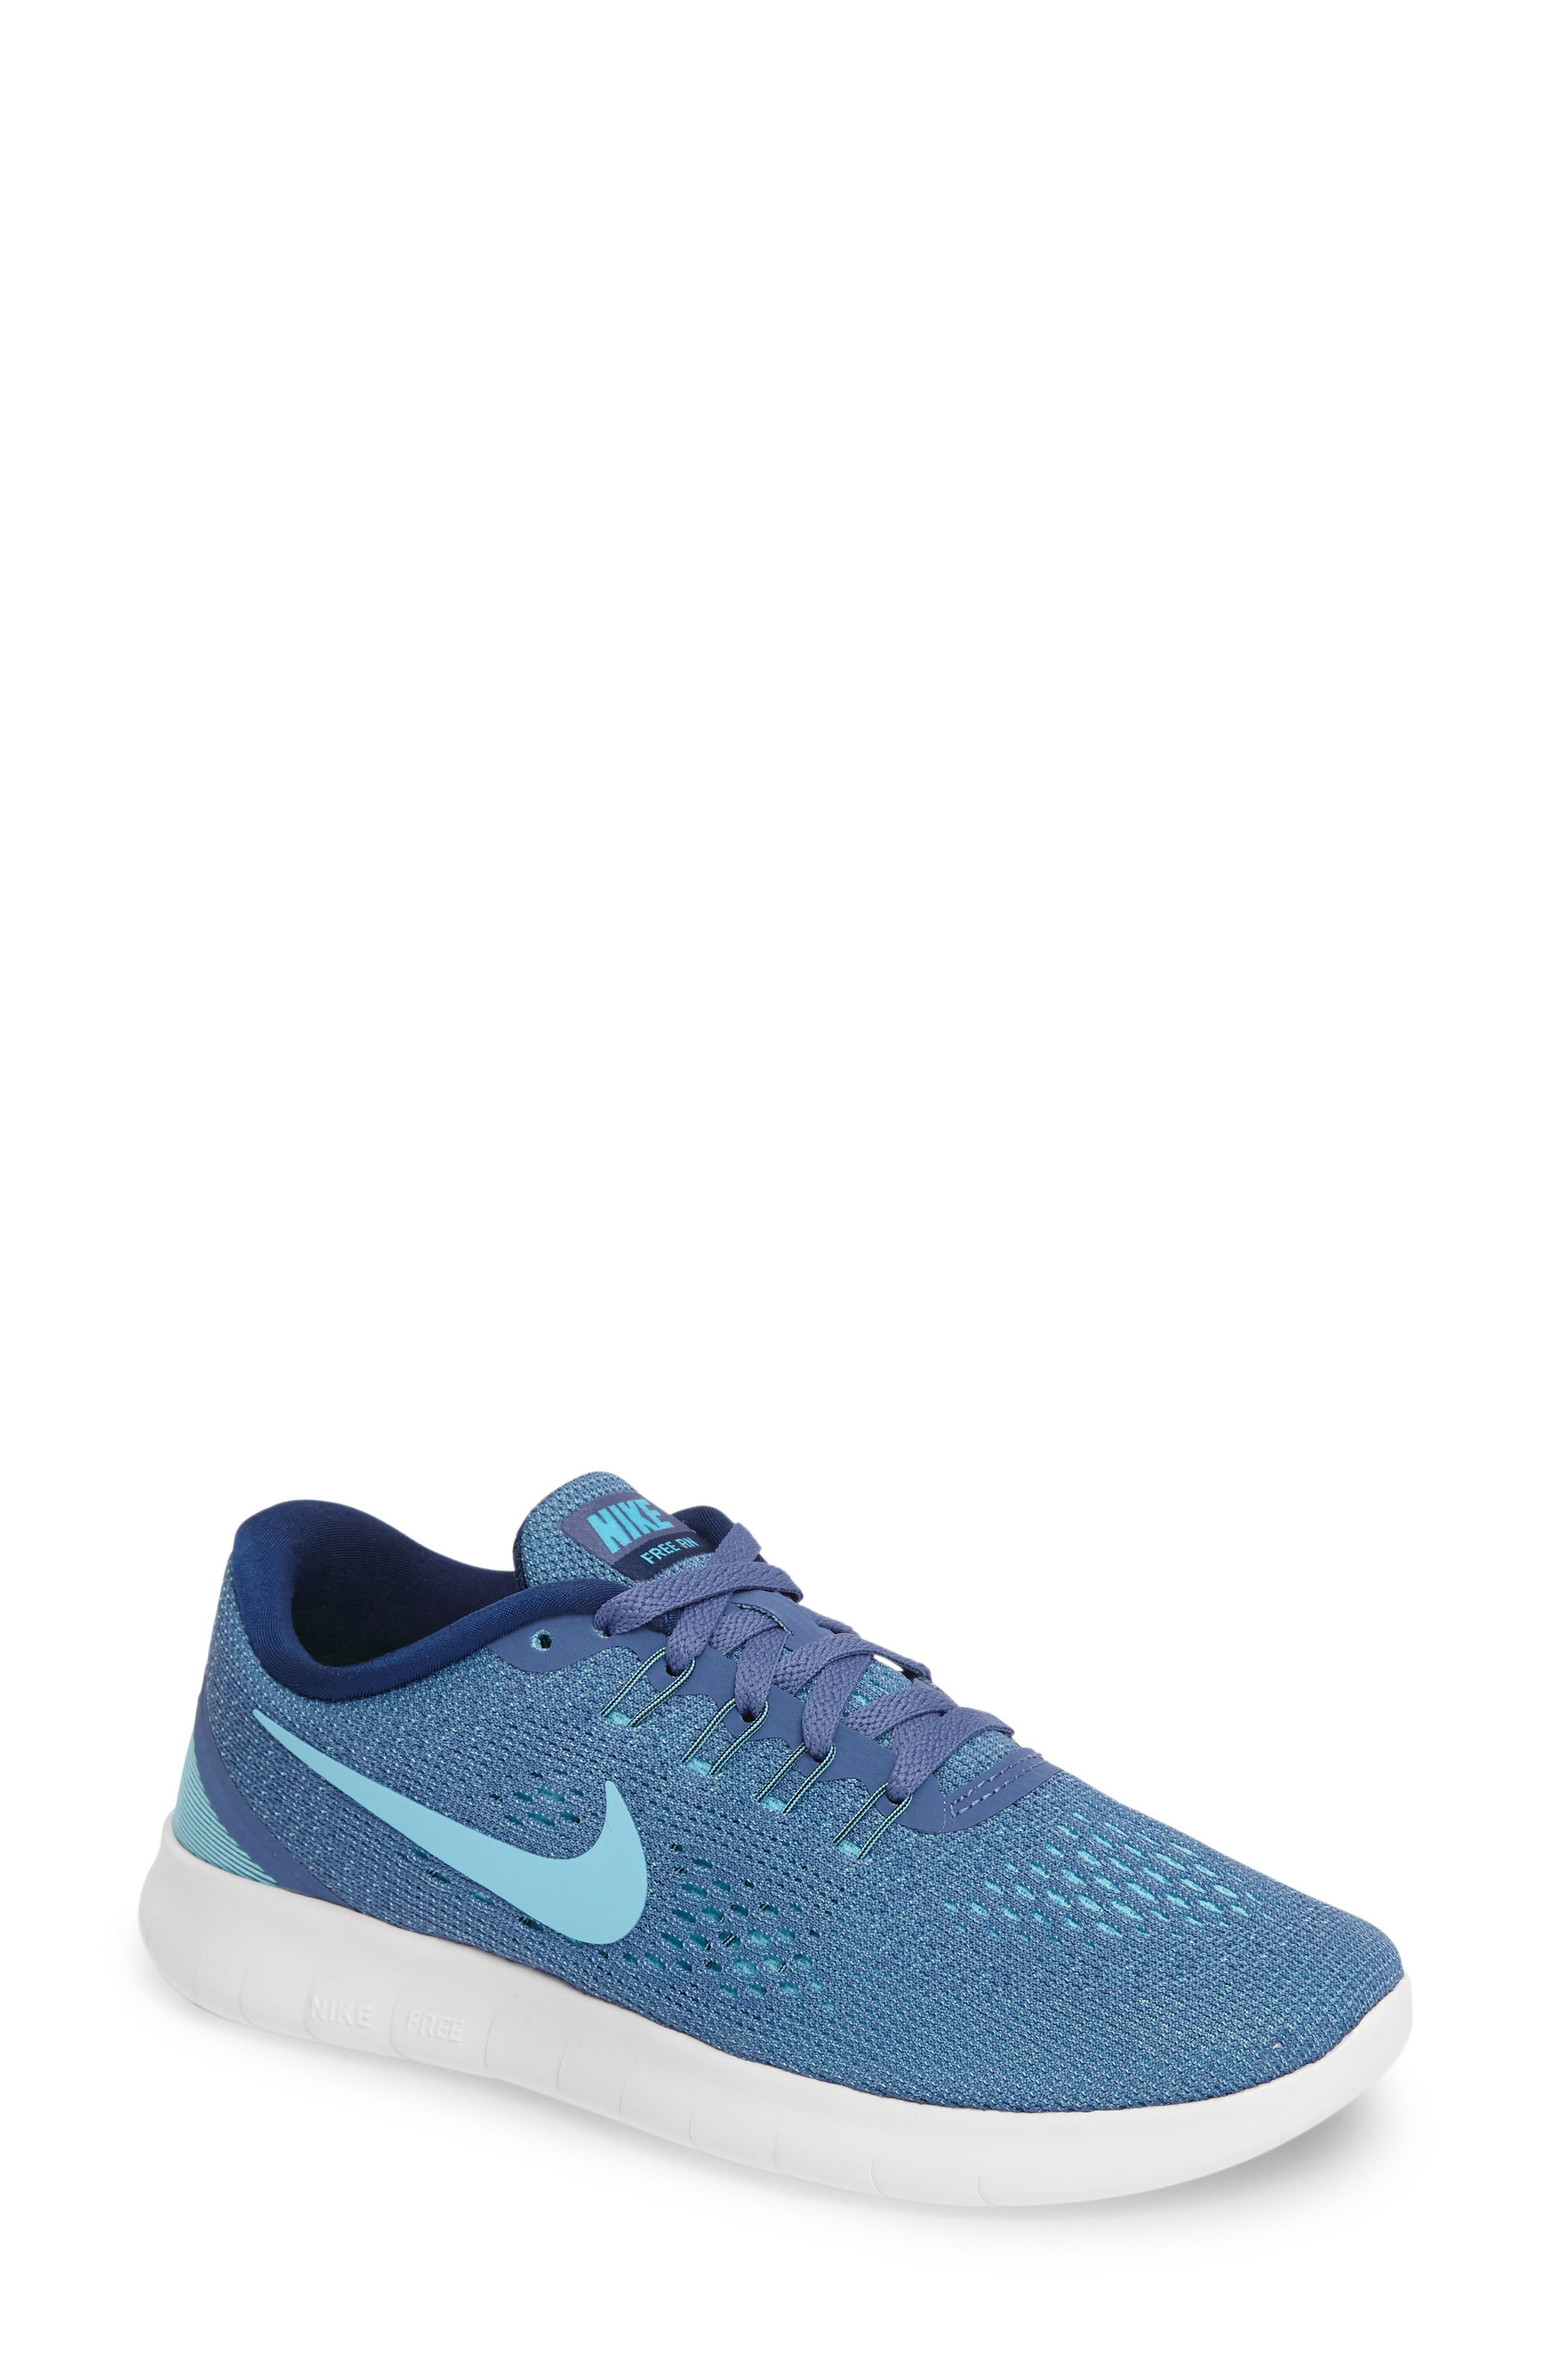 Main Image - Nike Free RN Running Shoe (Women)